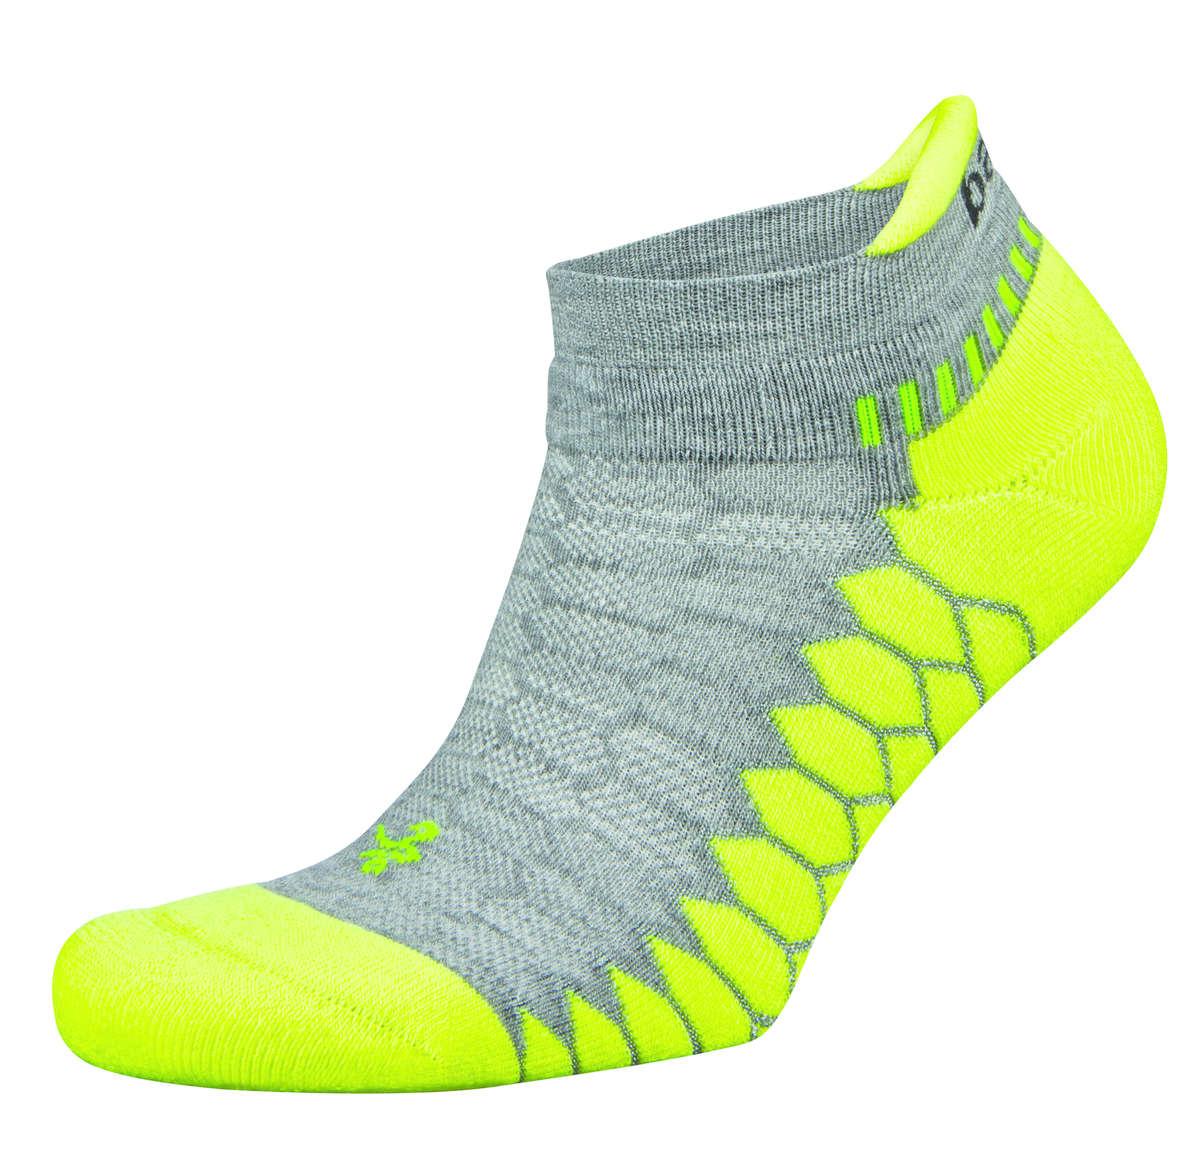 Balega Silver Sportsok Grijs/Lime groen - S